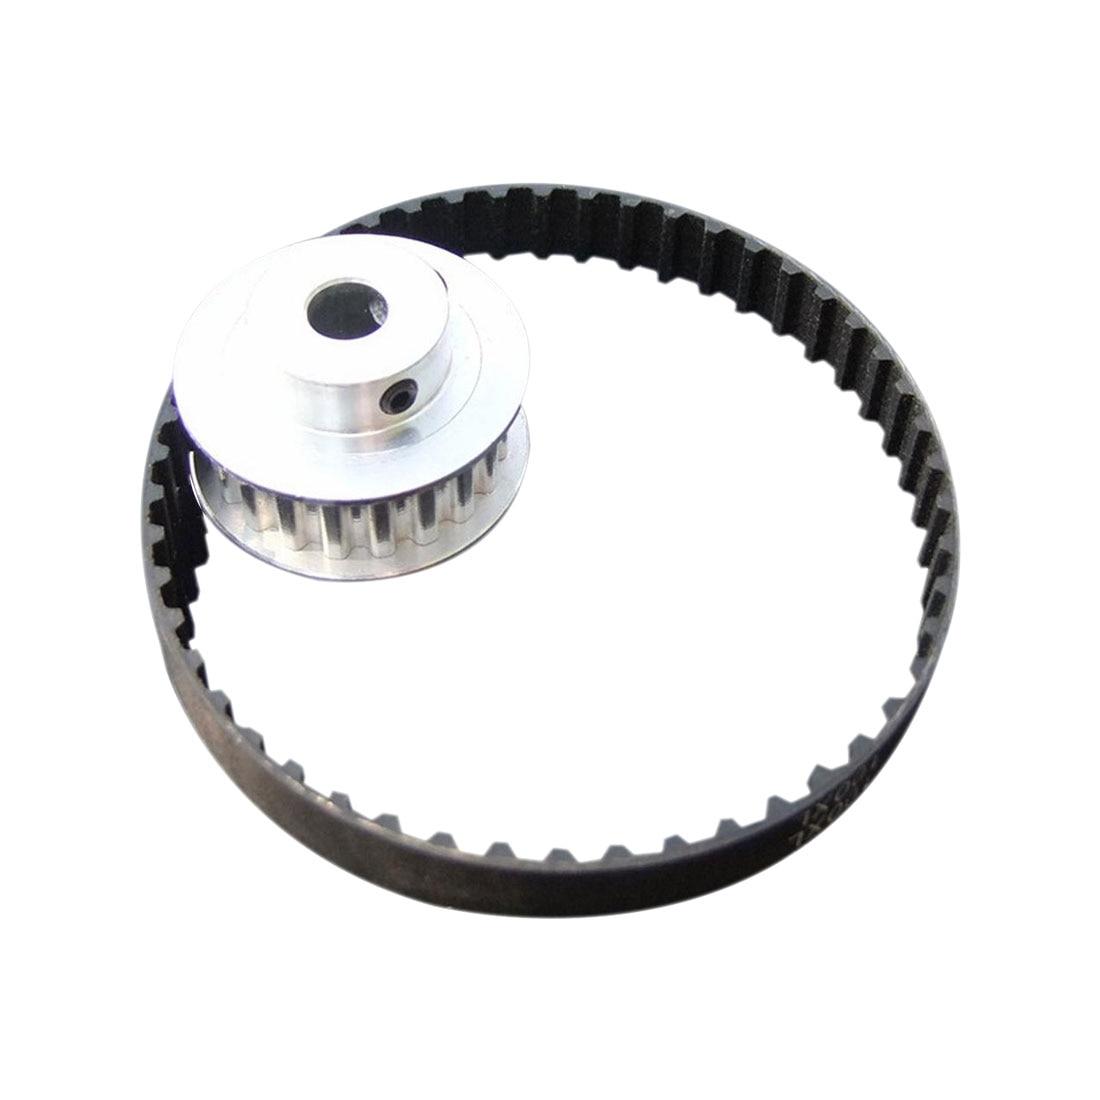 Timing Belt Kit Small Lathe Accessories Trimming Belt